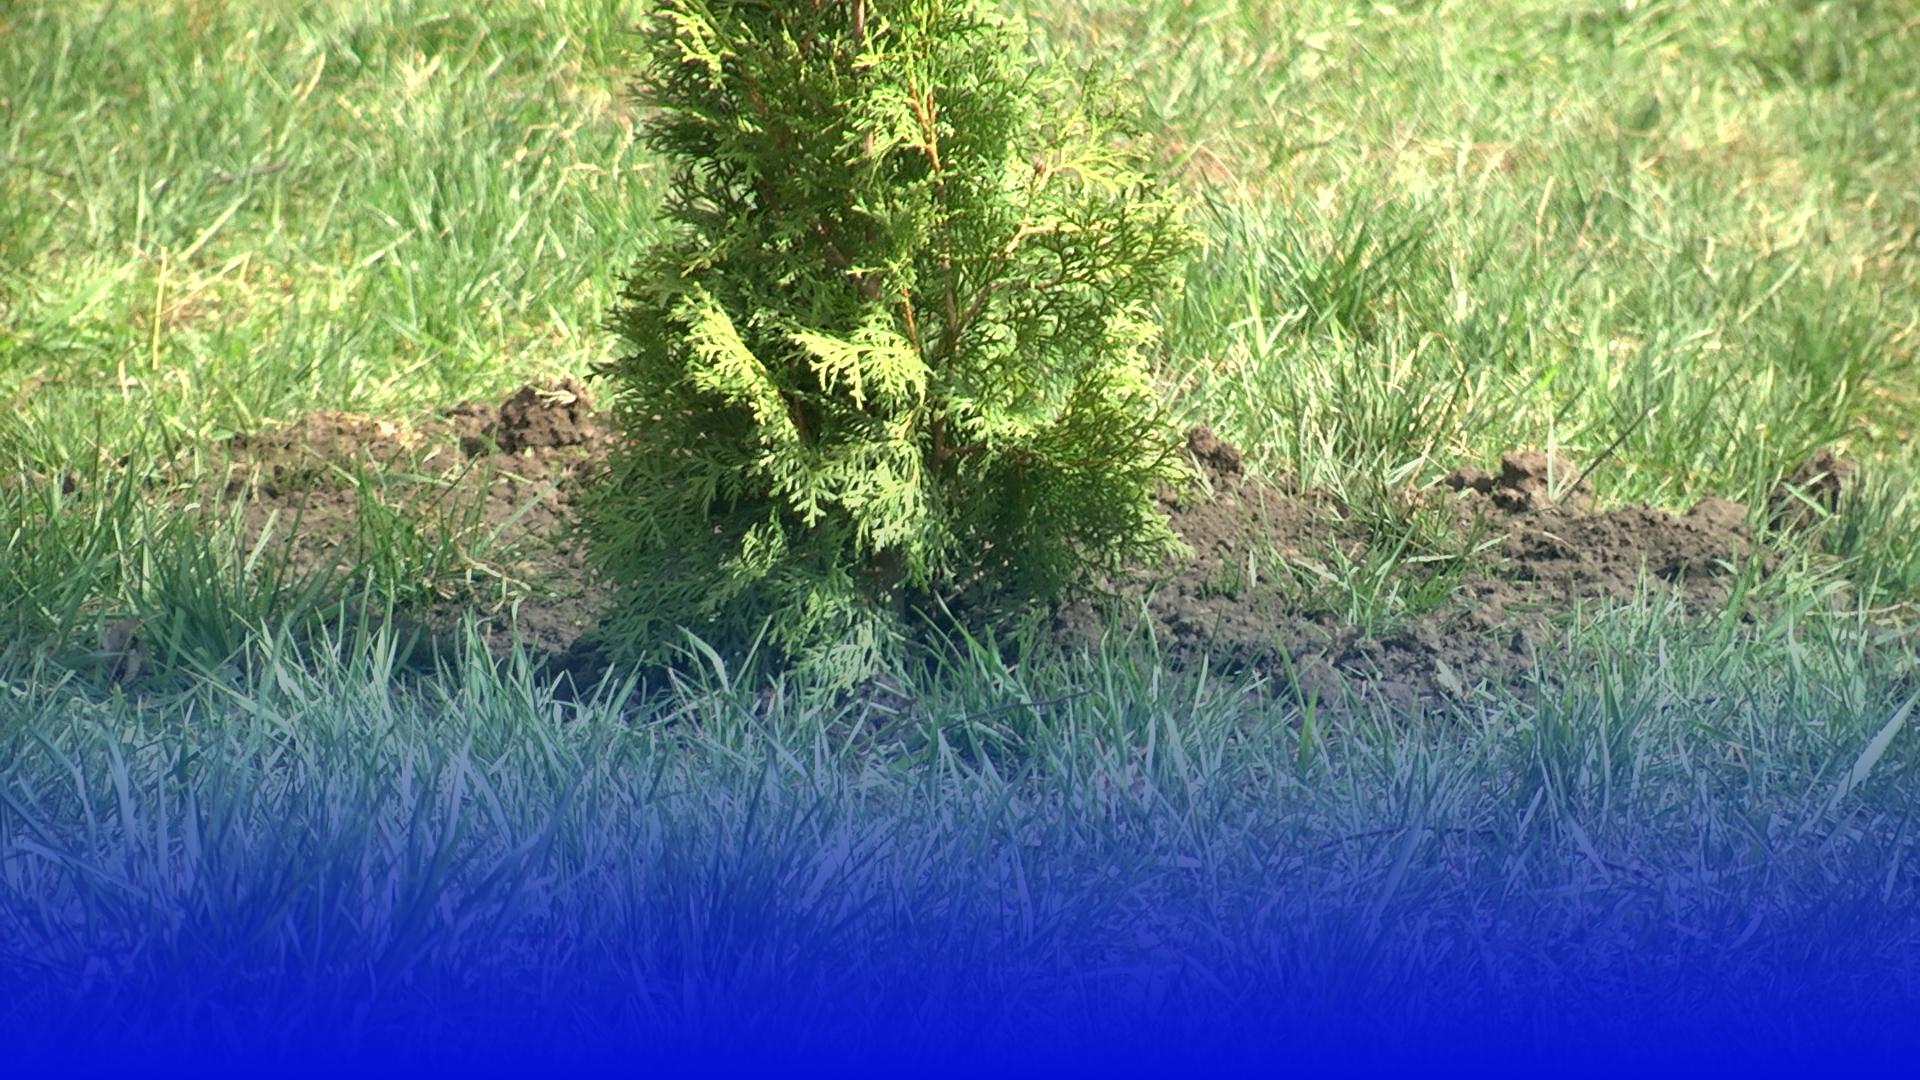 Понад 500 молодих дерев посадили у Тернополі в рамках двомісячника благоустрою